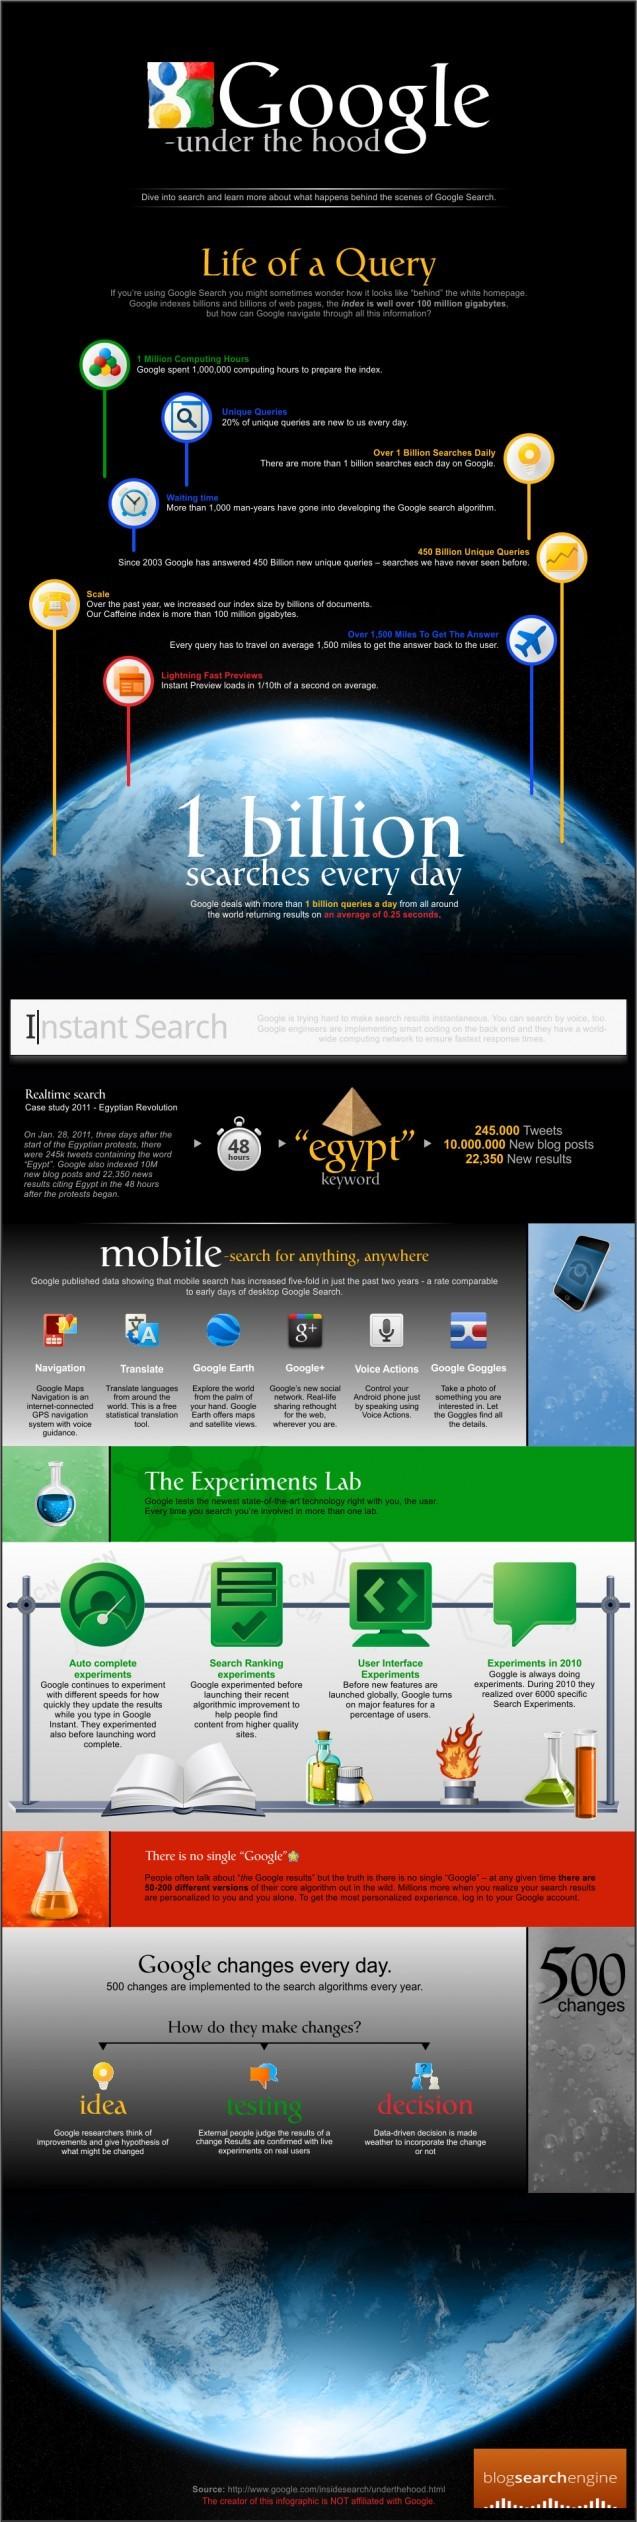 Google Search en 1 image